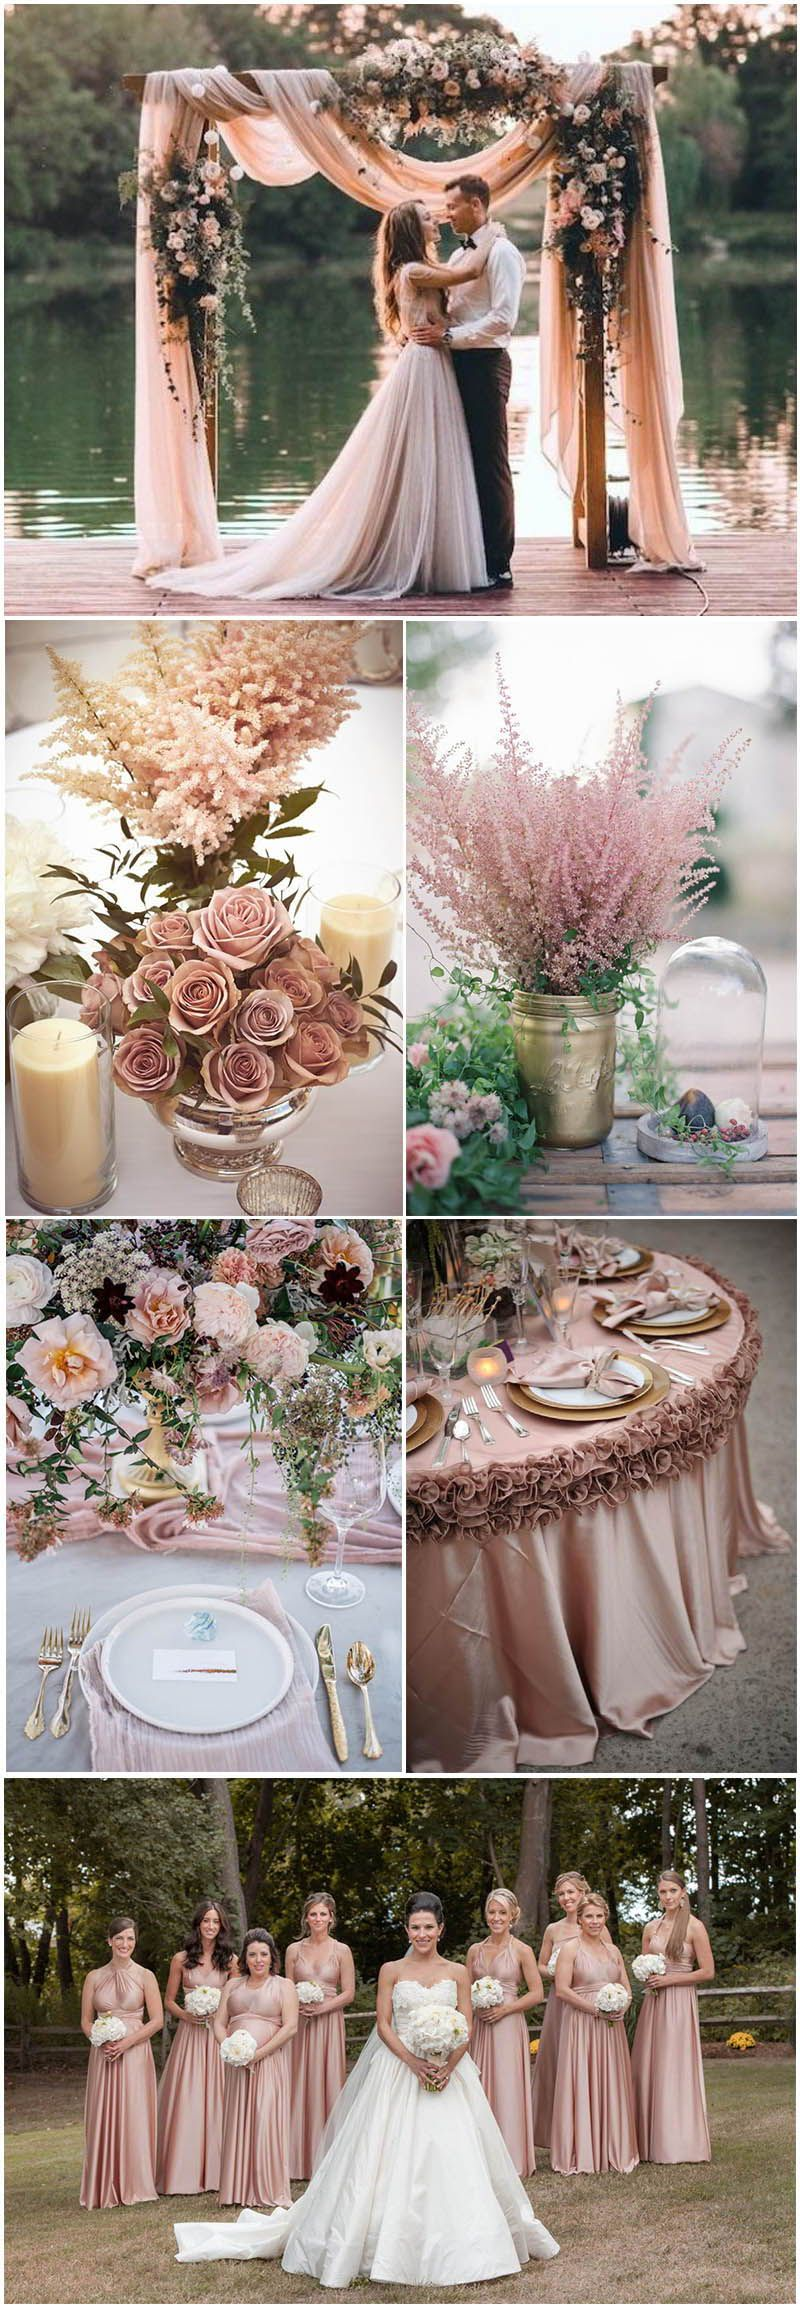 Romantic Dusty Rose Wedding Color Ideas for  Weddings